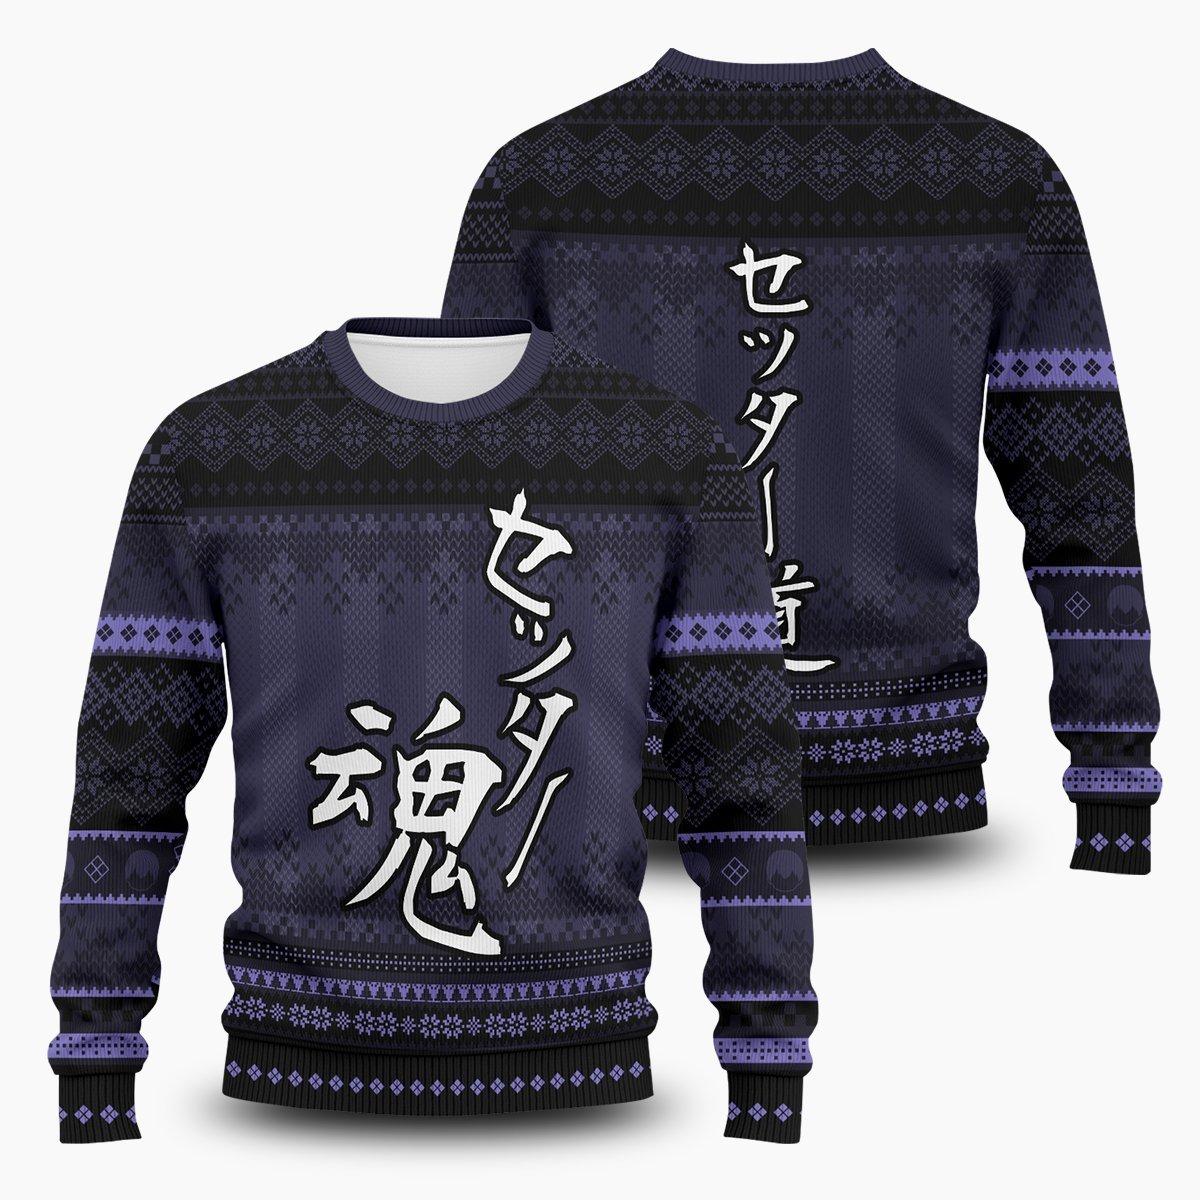 The Way of the Setter Unisex Wool Sweater FDM0310 S Official Otaku Treat Merch